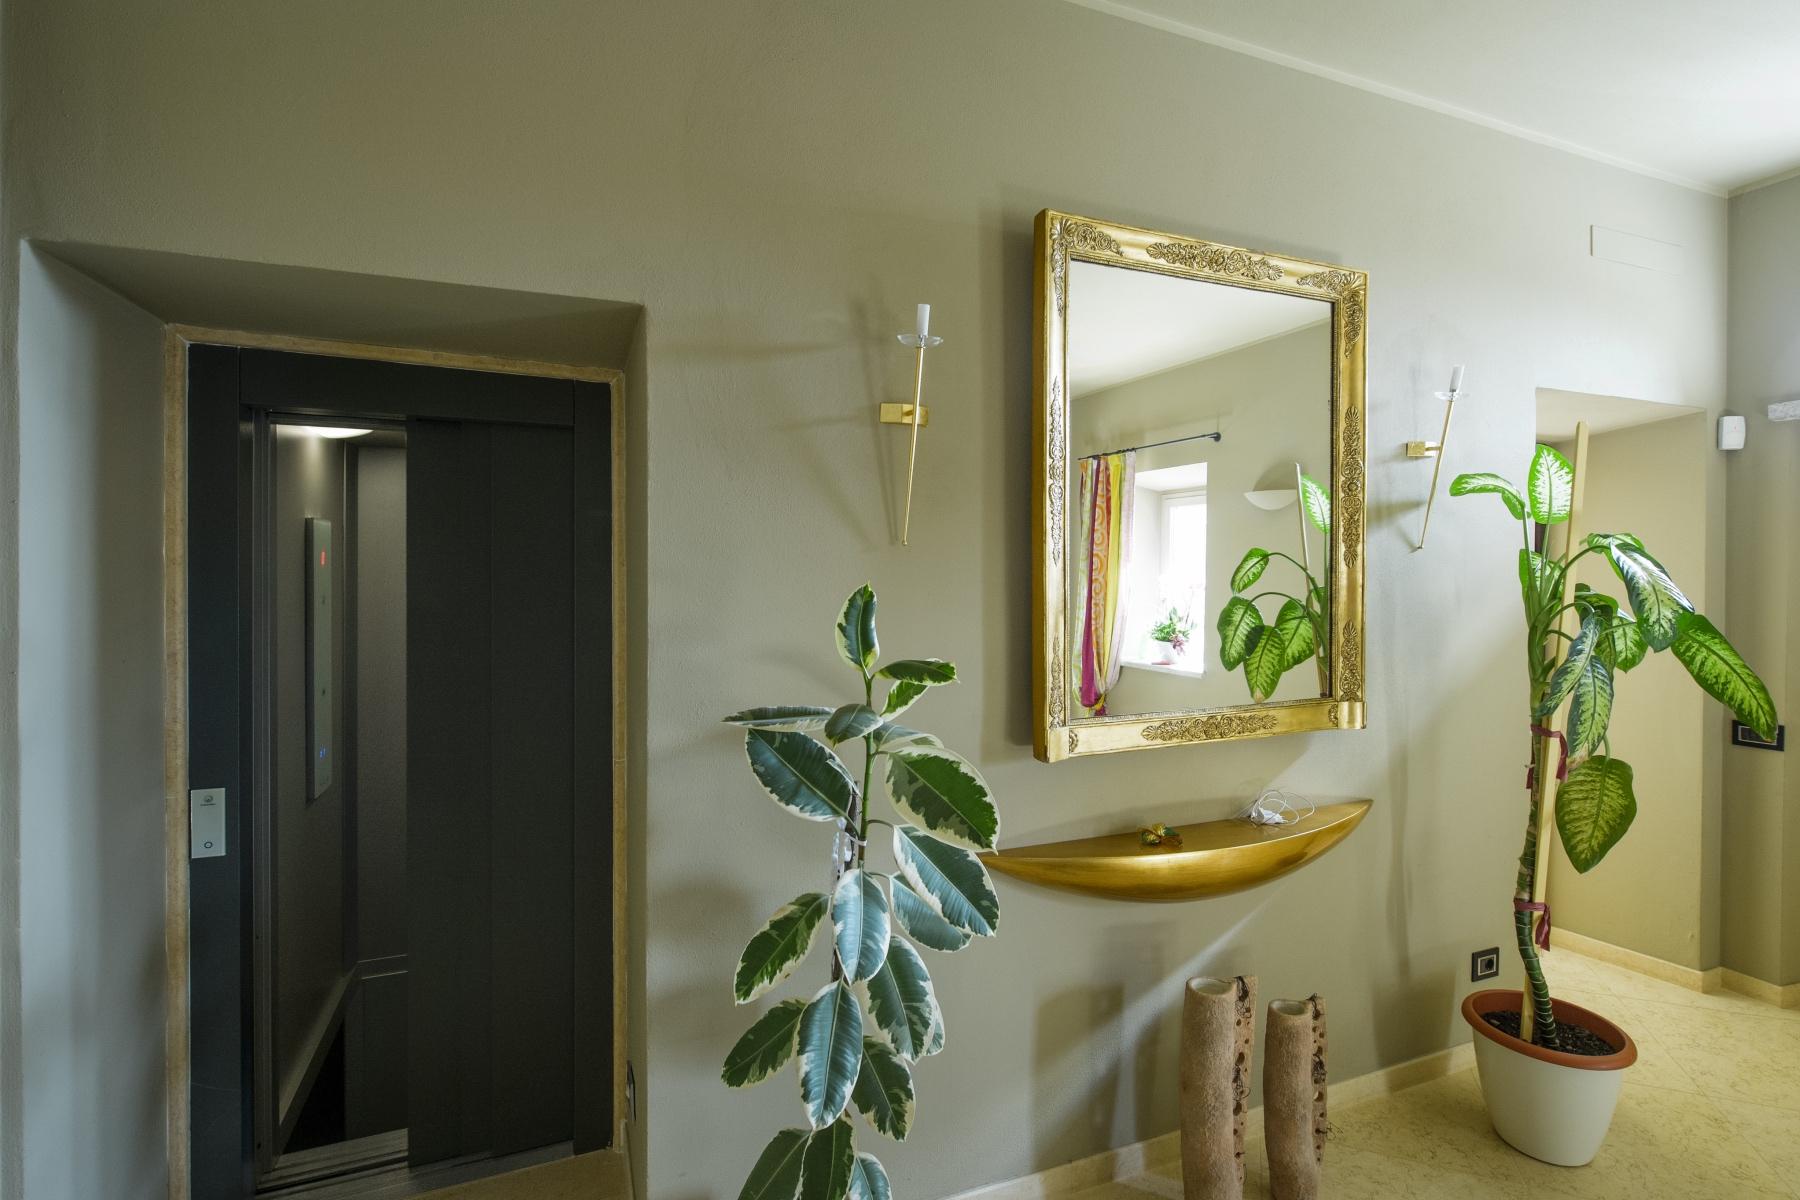 Casa indipendente in Vendita a Agrate Conturbia: 5 locali, 400 mq - Foto 12